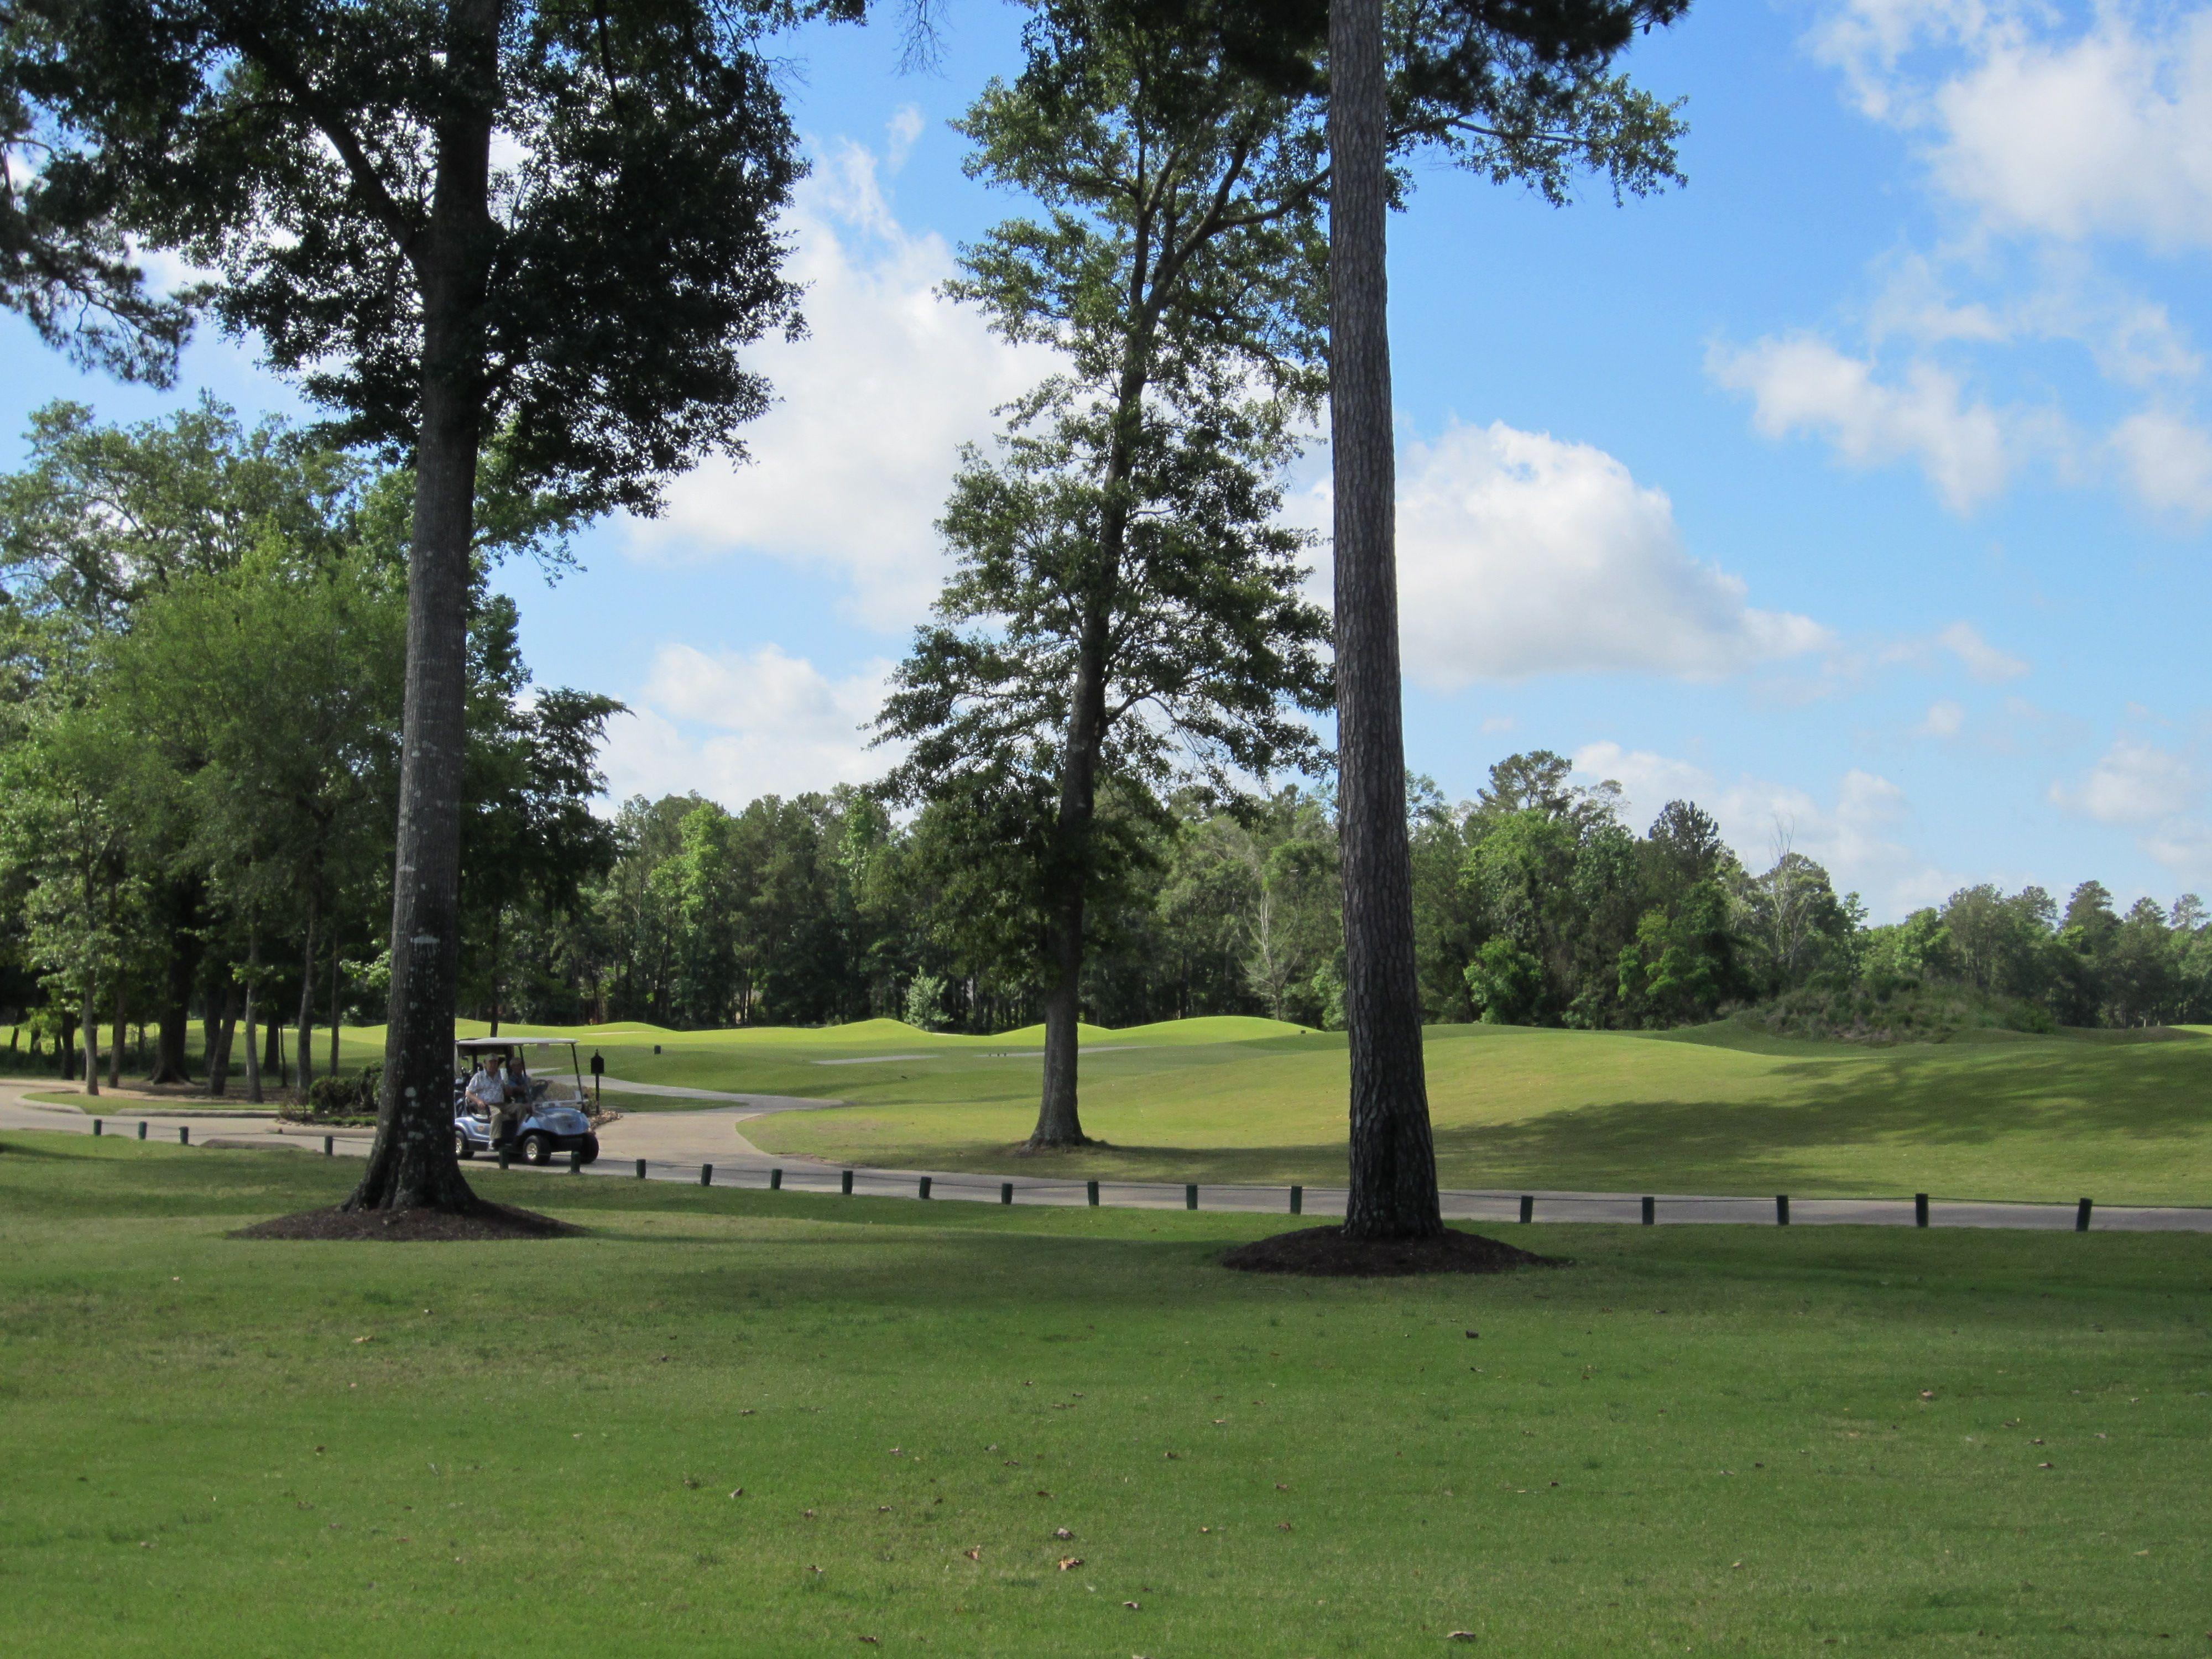 Lake Windcrest's Golf Course Lake, Magnolia, Texas real